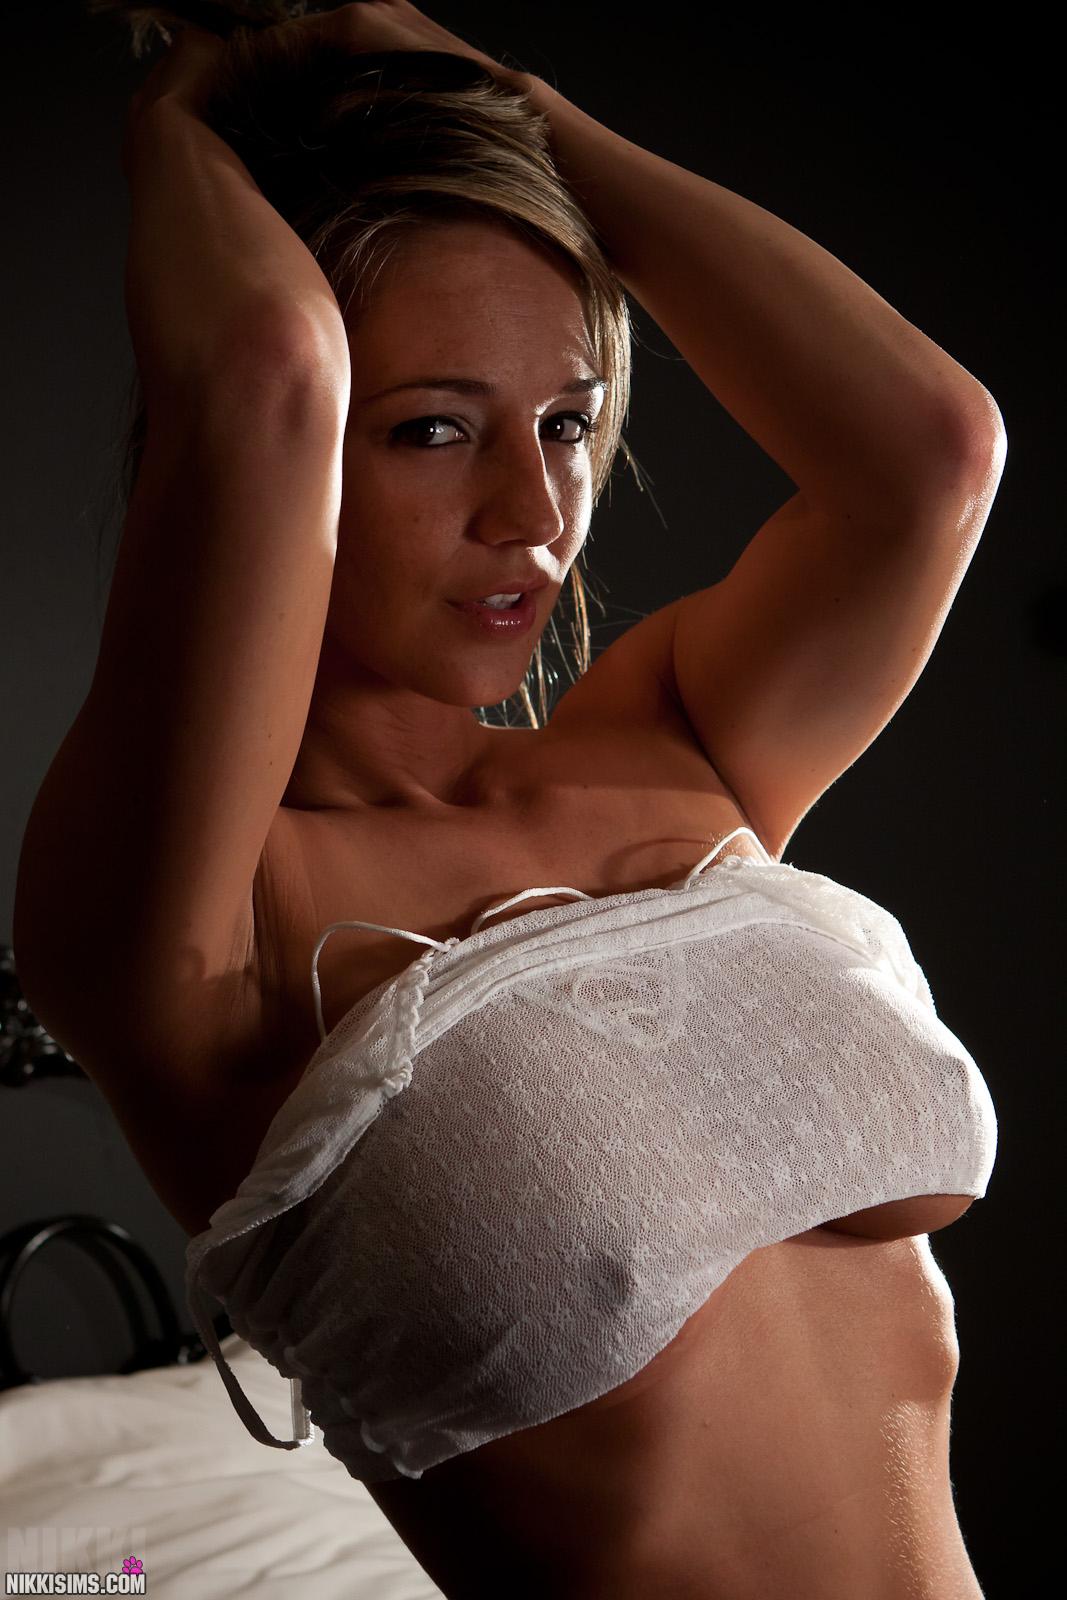 Seems brilliant big boobs tight shirt no bra tits